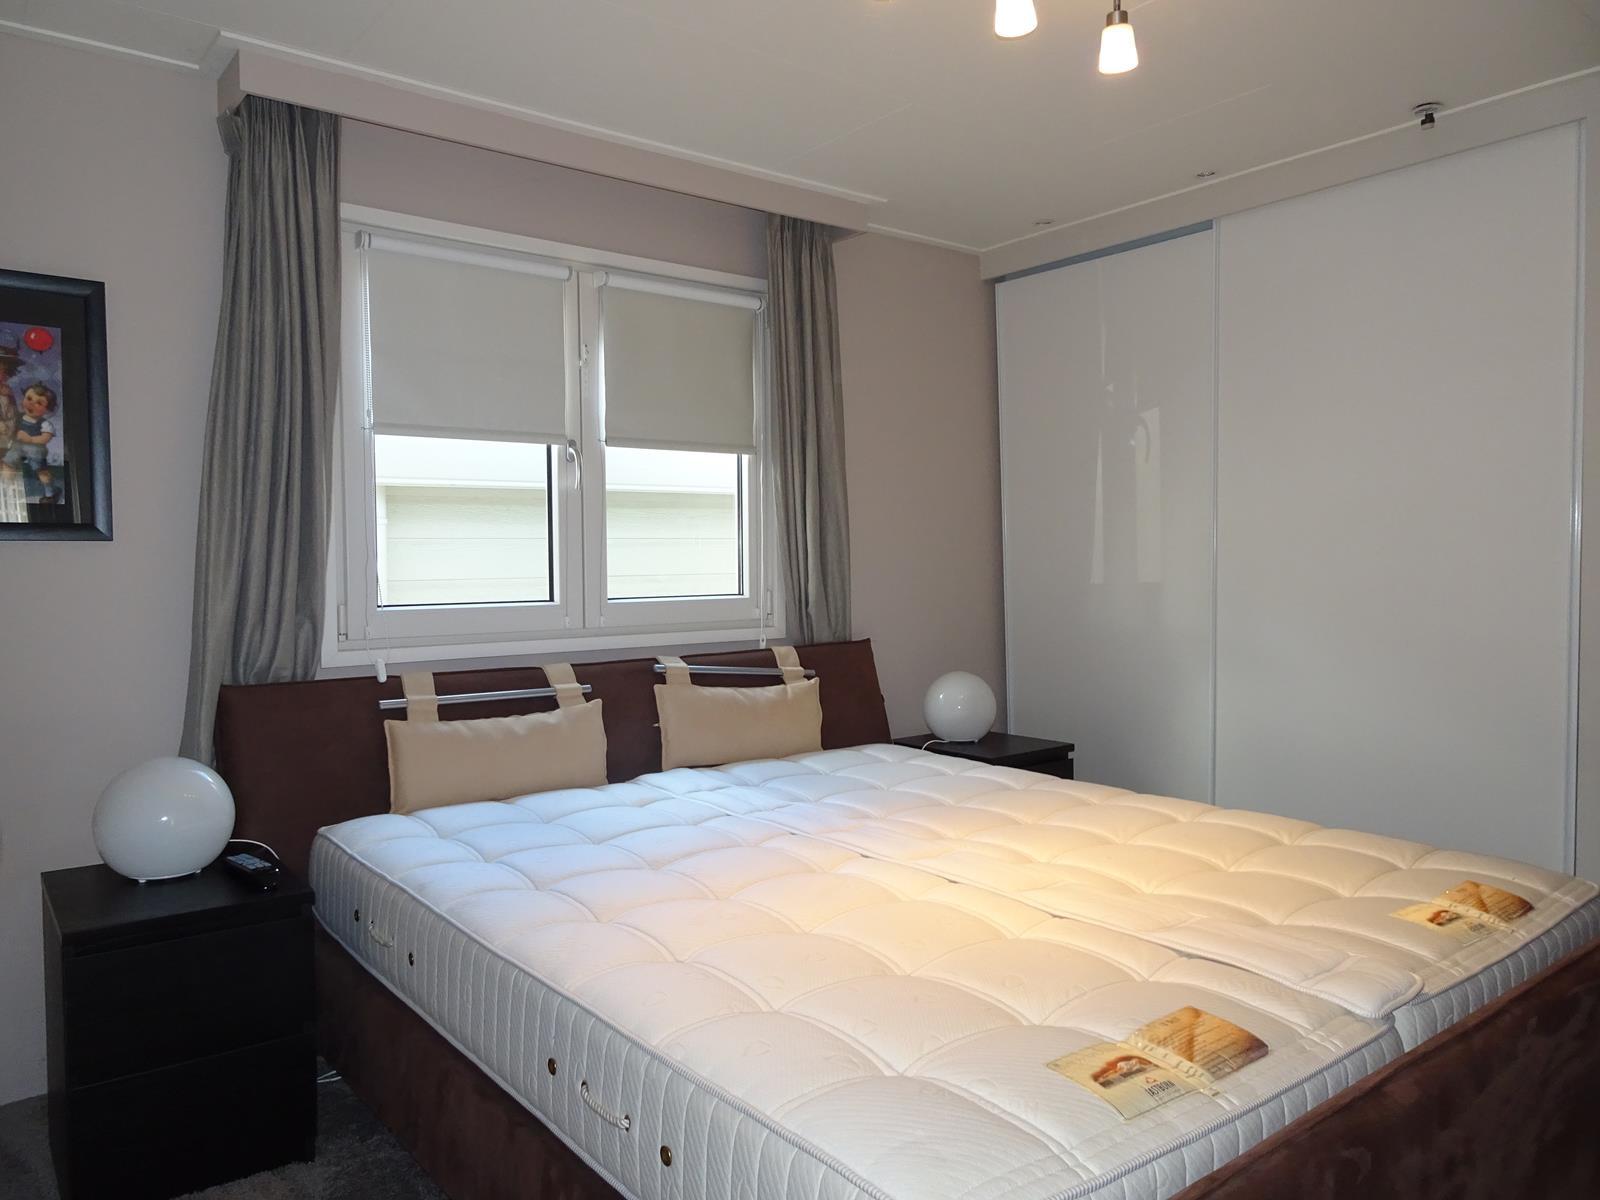 Vakantiehuis te koop Limburg Susteren Hommelweg 2 K121 (14).jpg